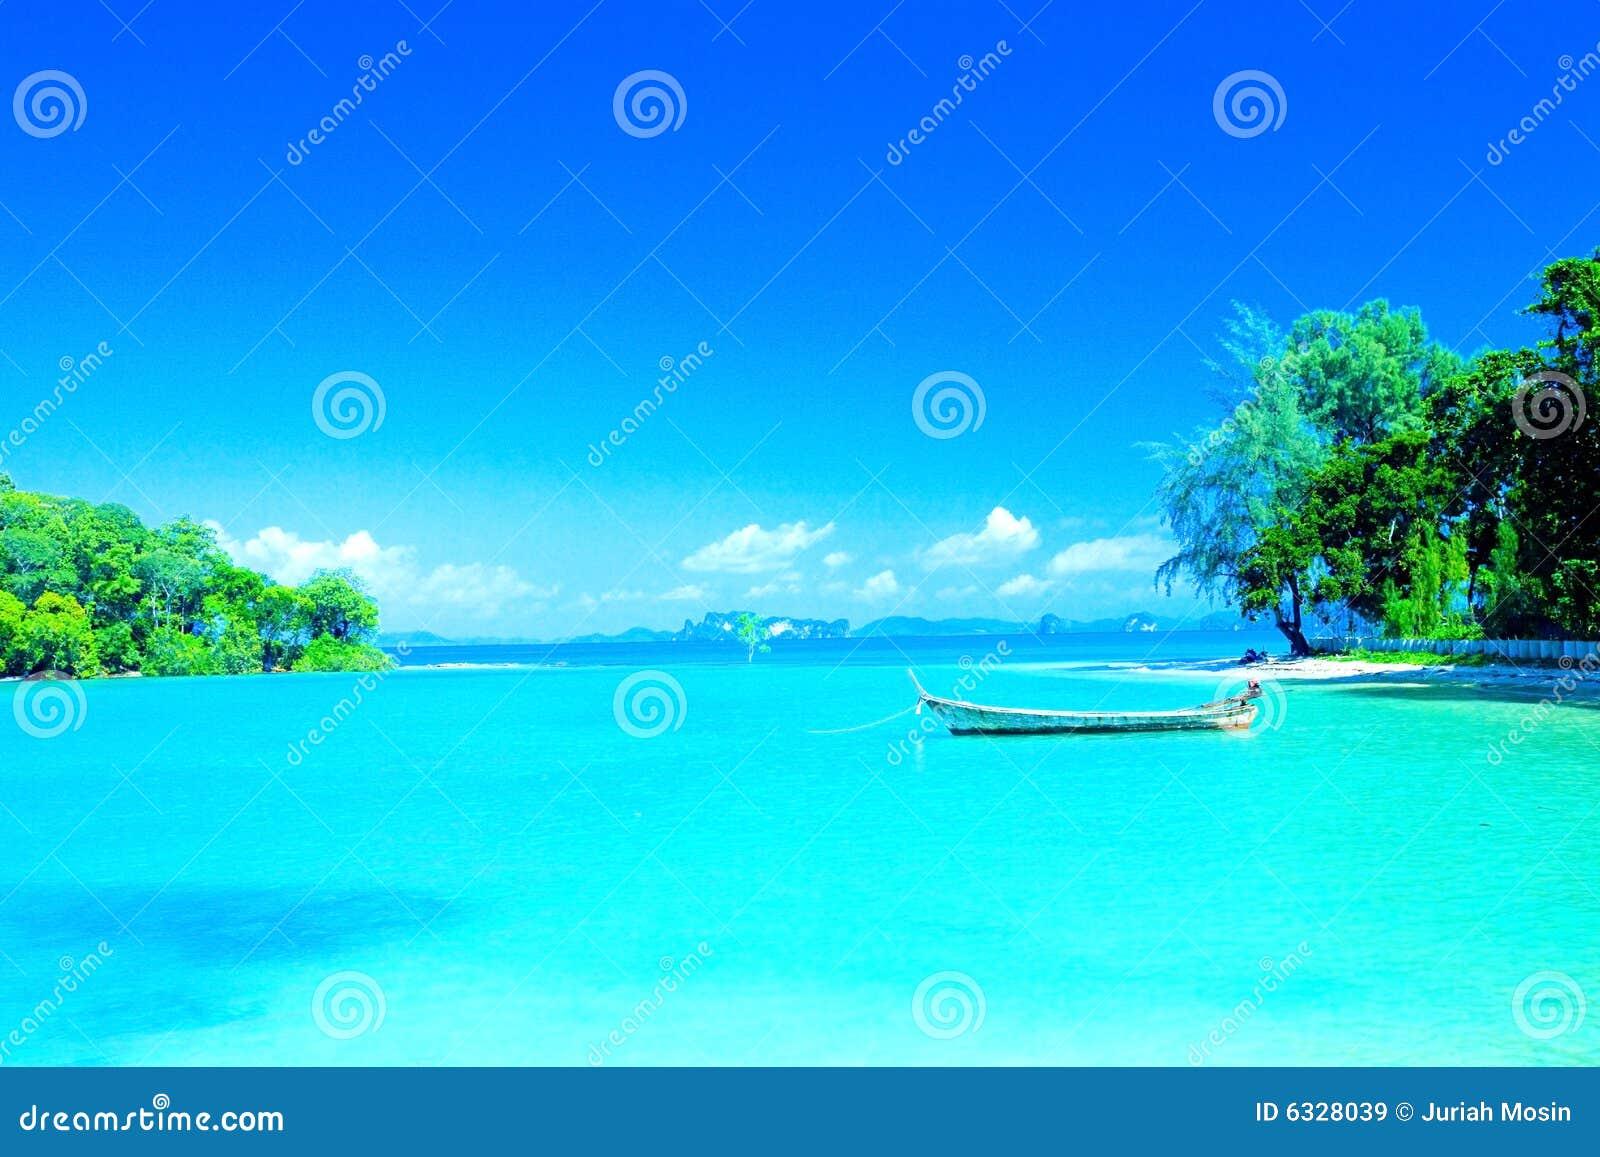 lagoon beach in resort bay of Krabi, Thailand.